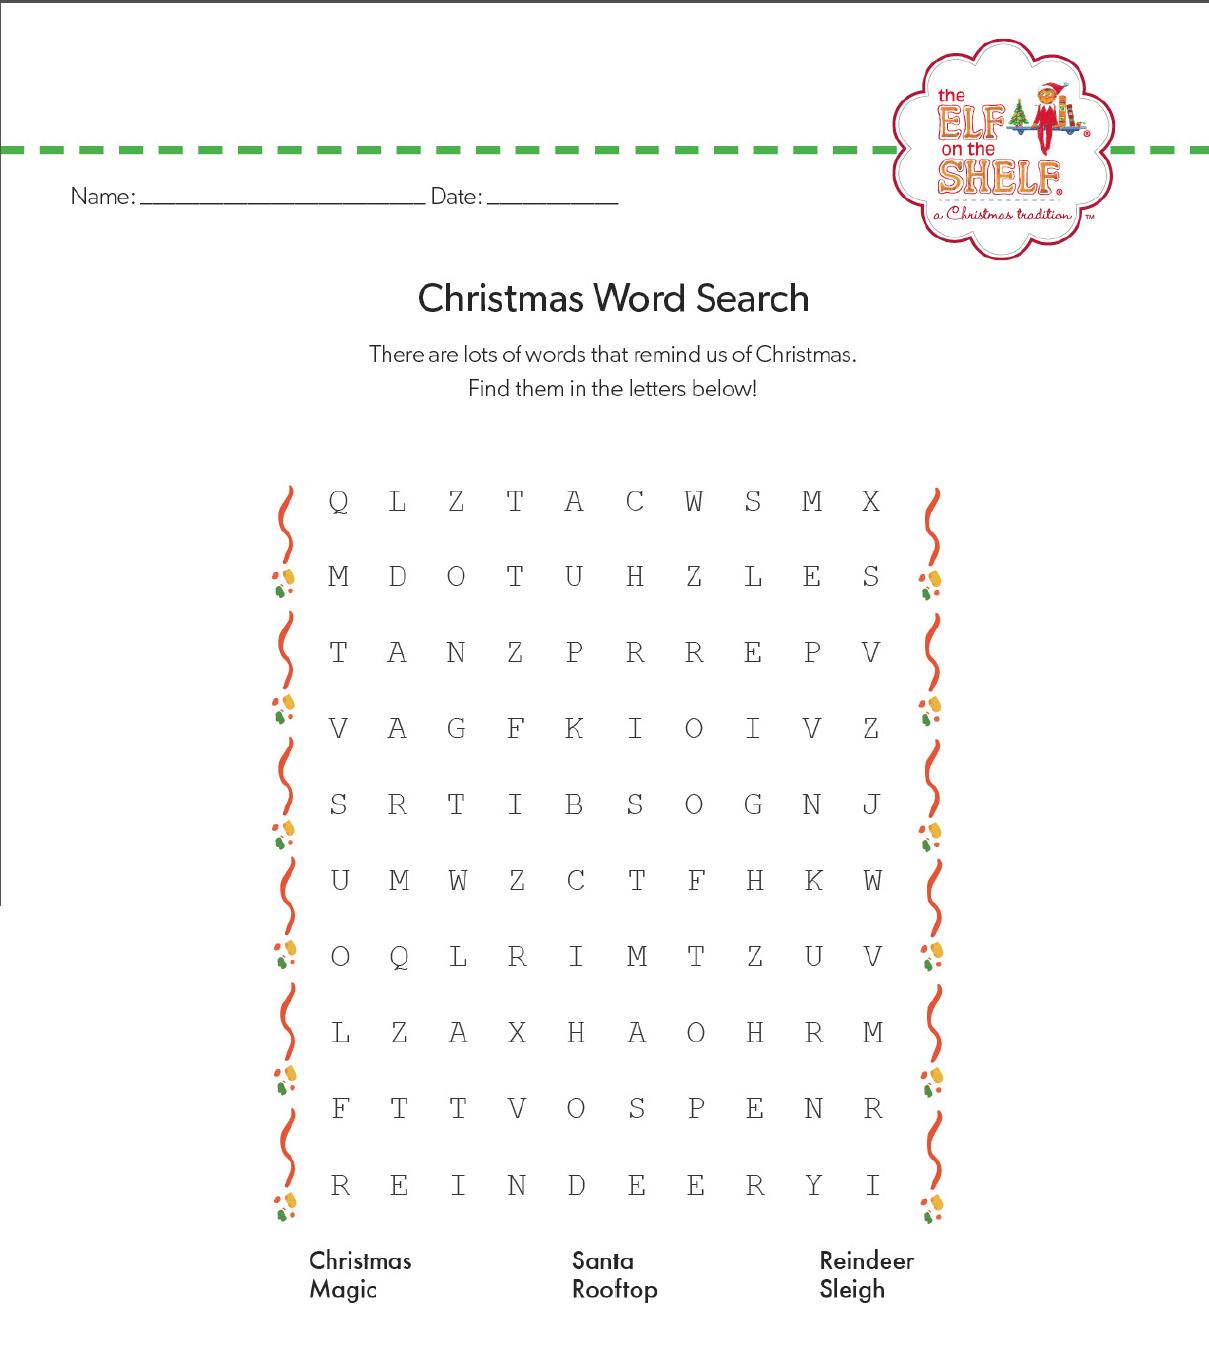 Christmas Elf On The Shelf Word Search | Christmas Coloring